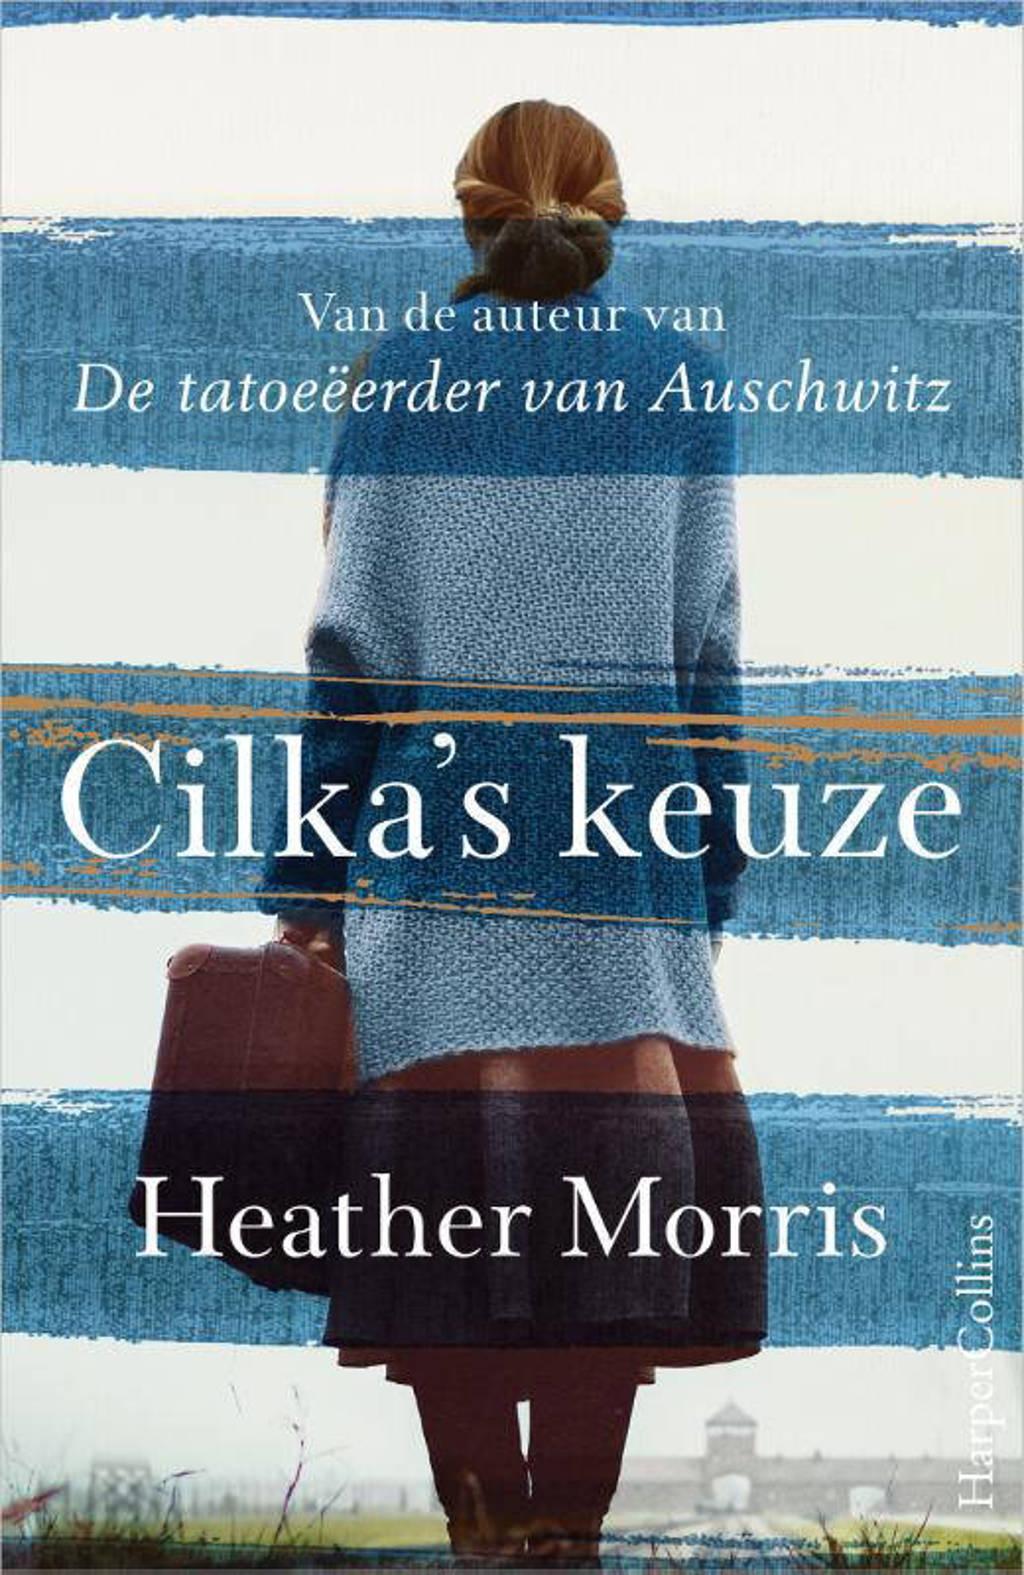 Cilka's keuze - Heather Morris